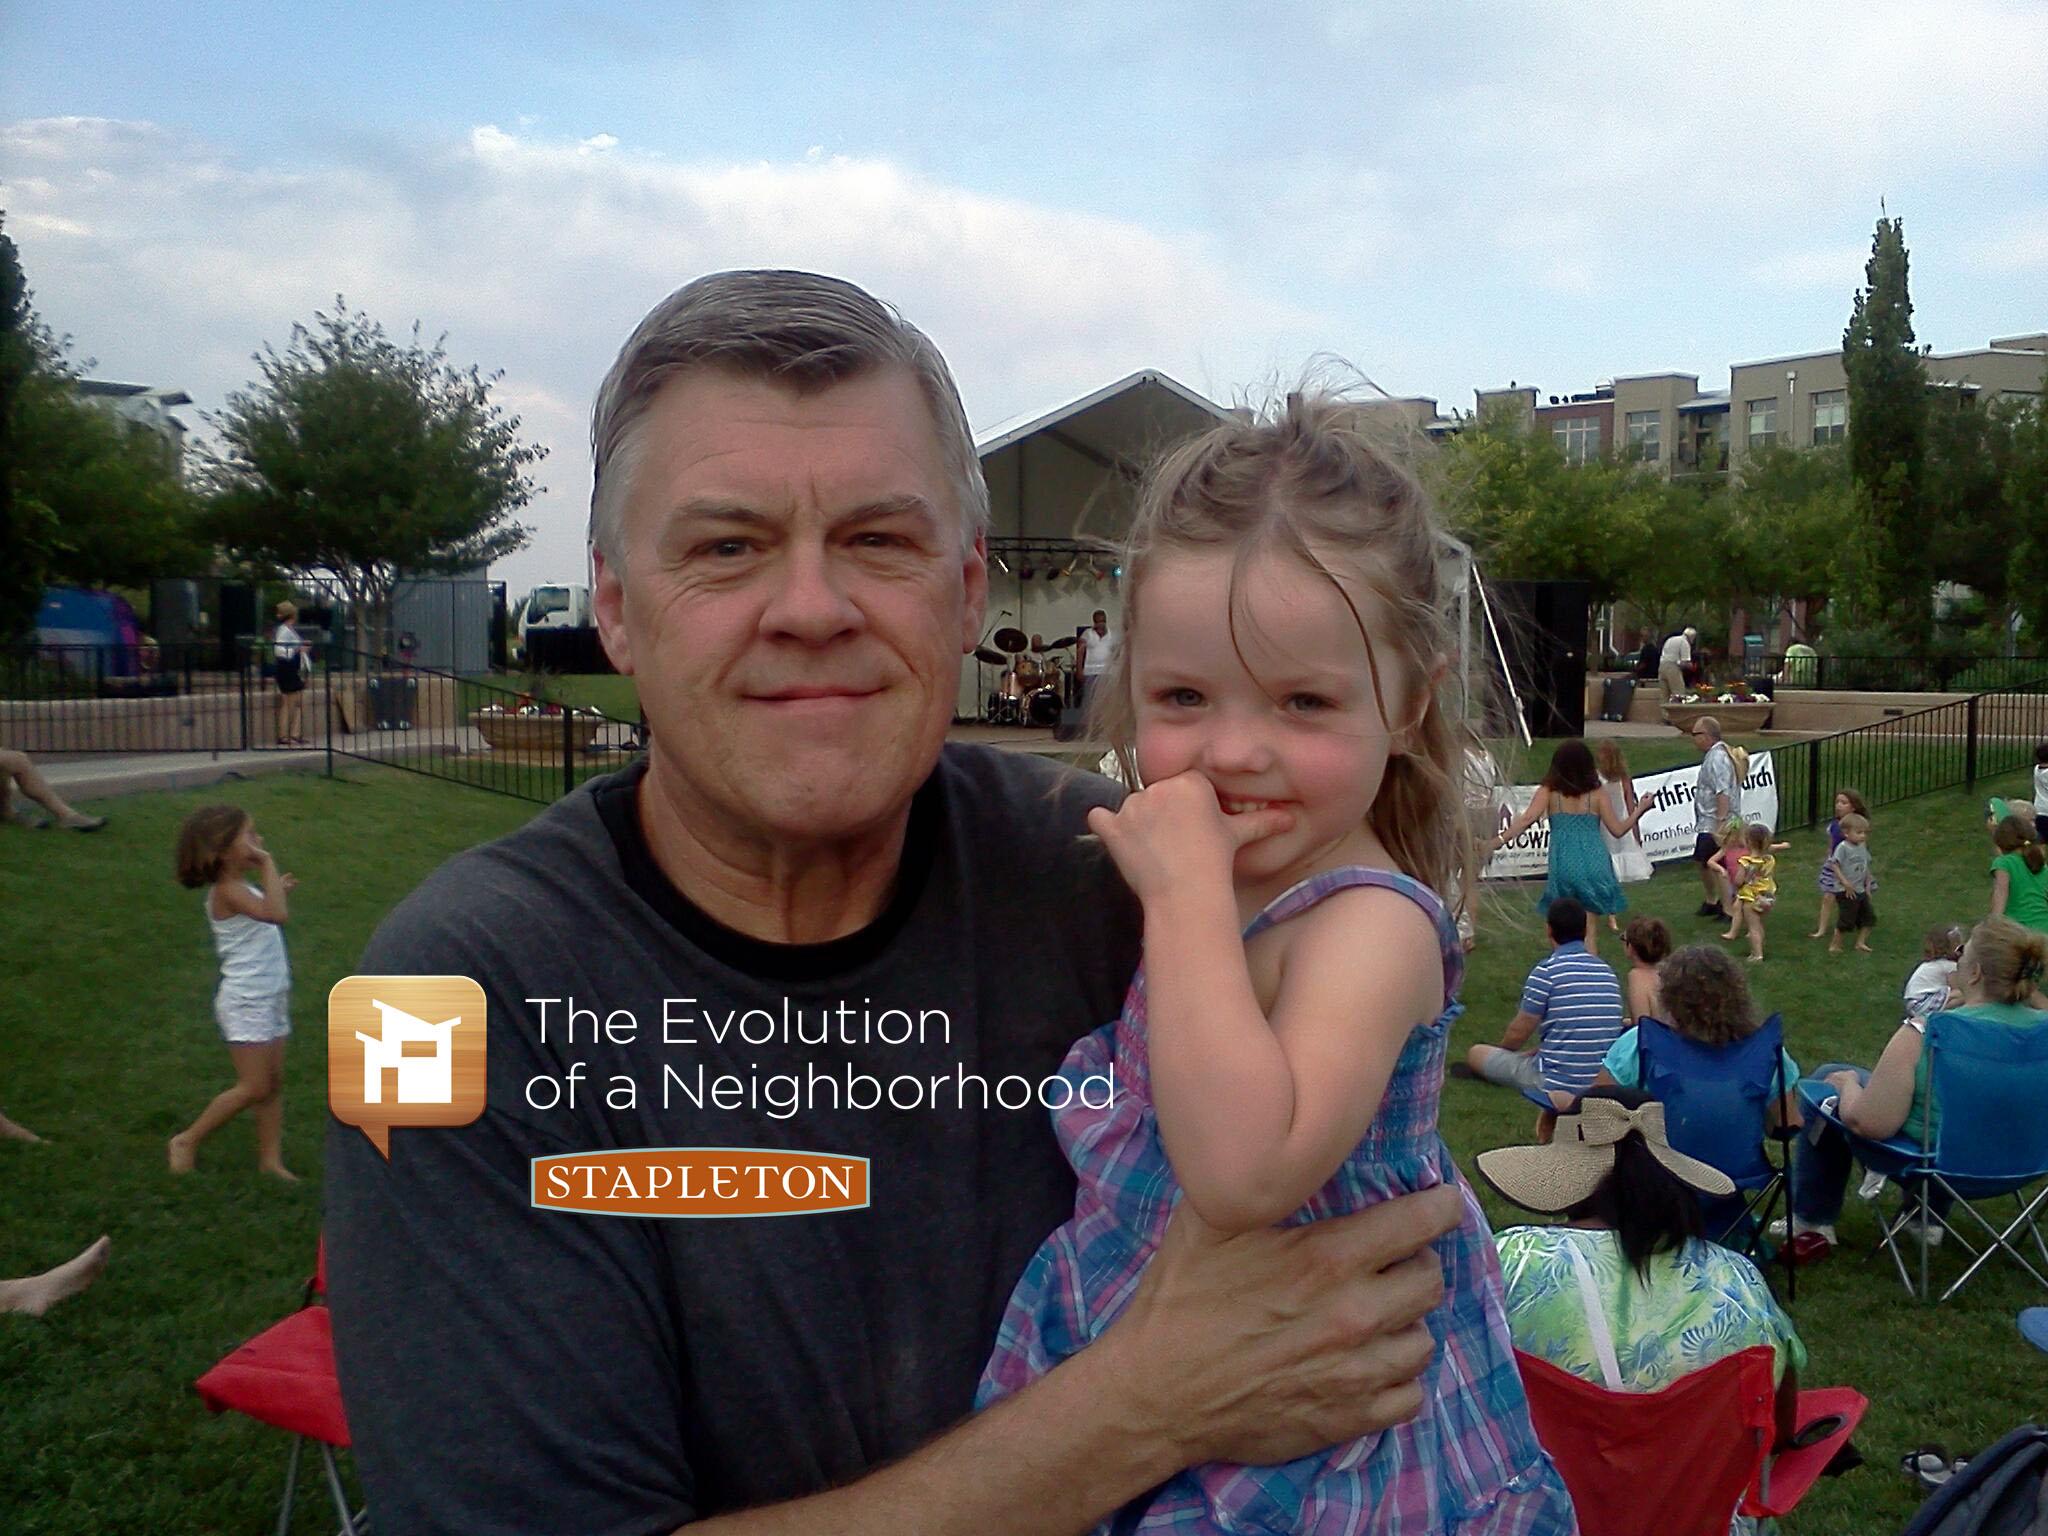 Evolution of a Neighborhood Dennis Scott Stapleton